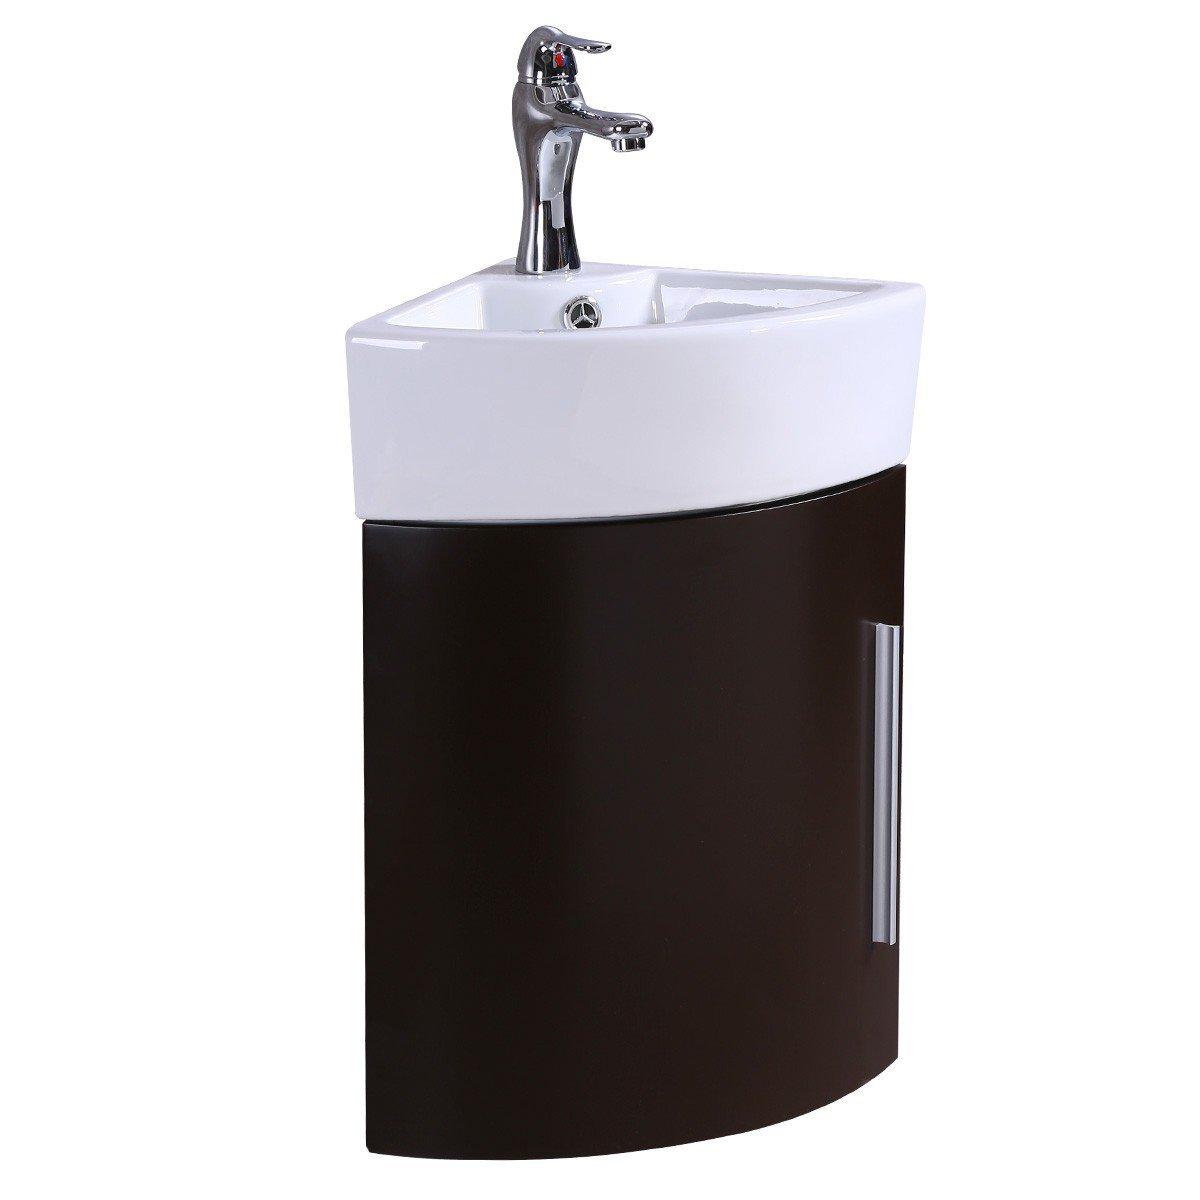 Corner Wall Mount Bathroom Vanity Sink White With Dark Oak Vanity Renovator's Supply